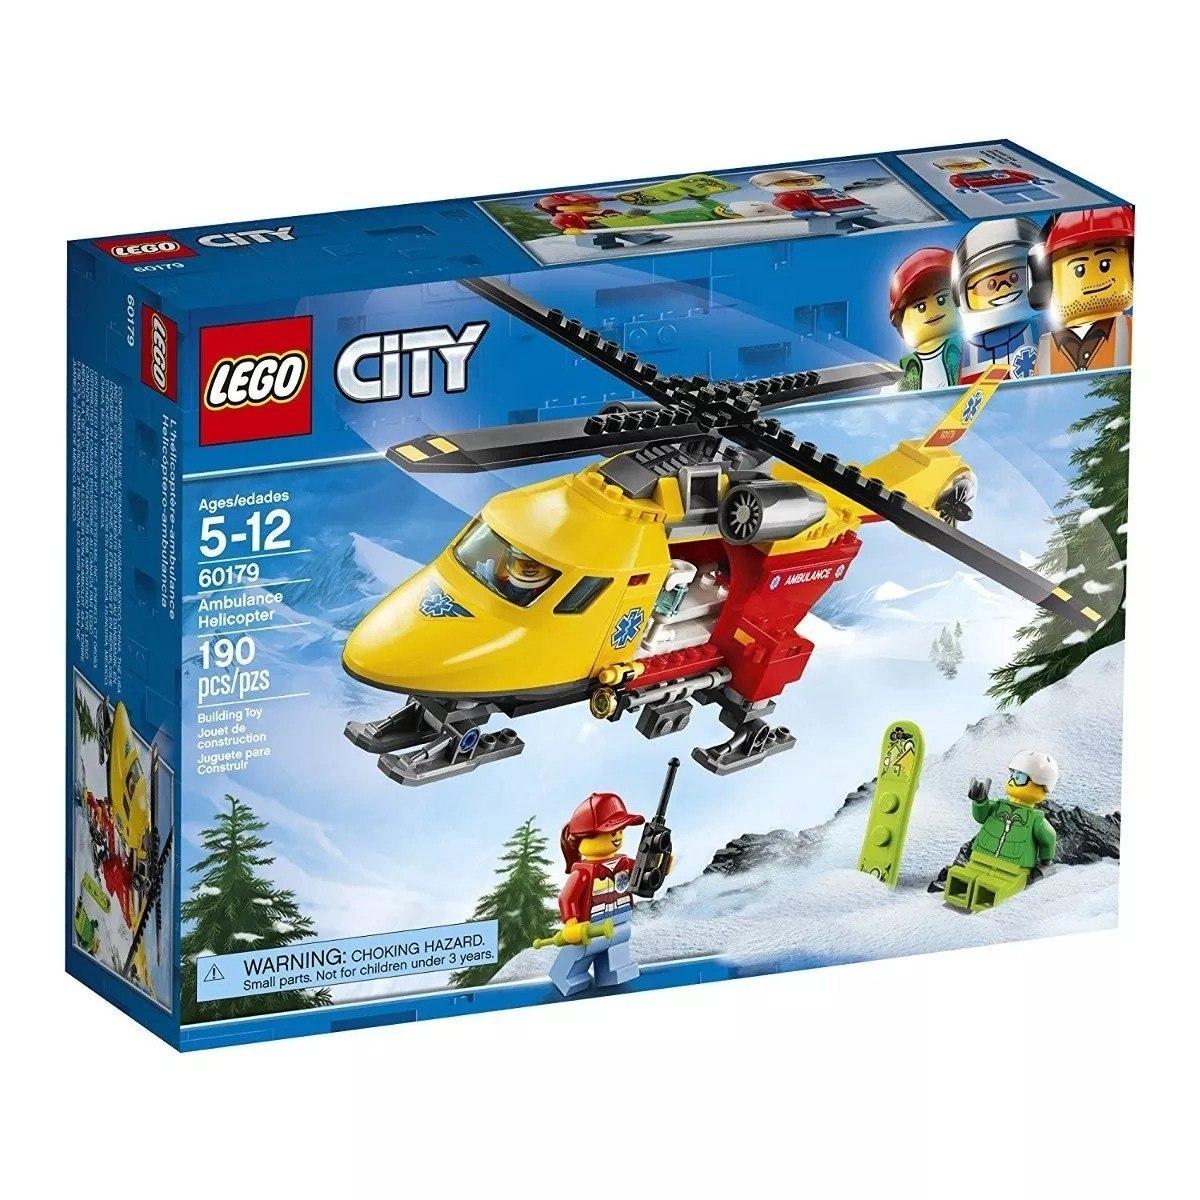 Aeroporto Lego : Lego city aeroporto de cidade de lego r em mercado